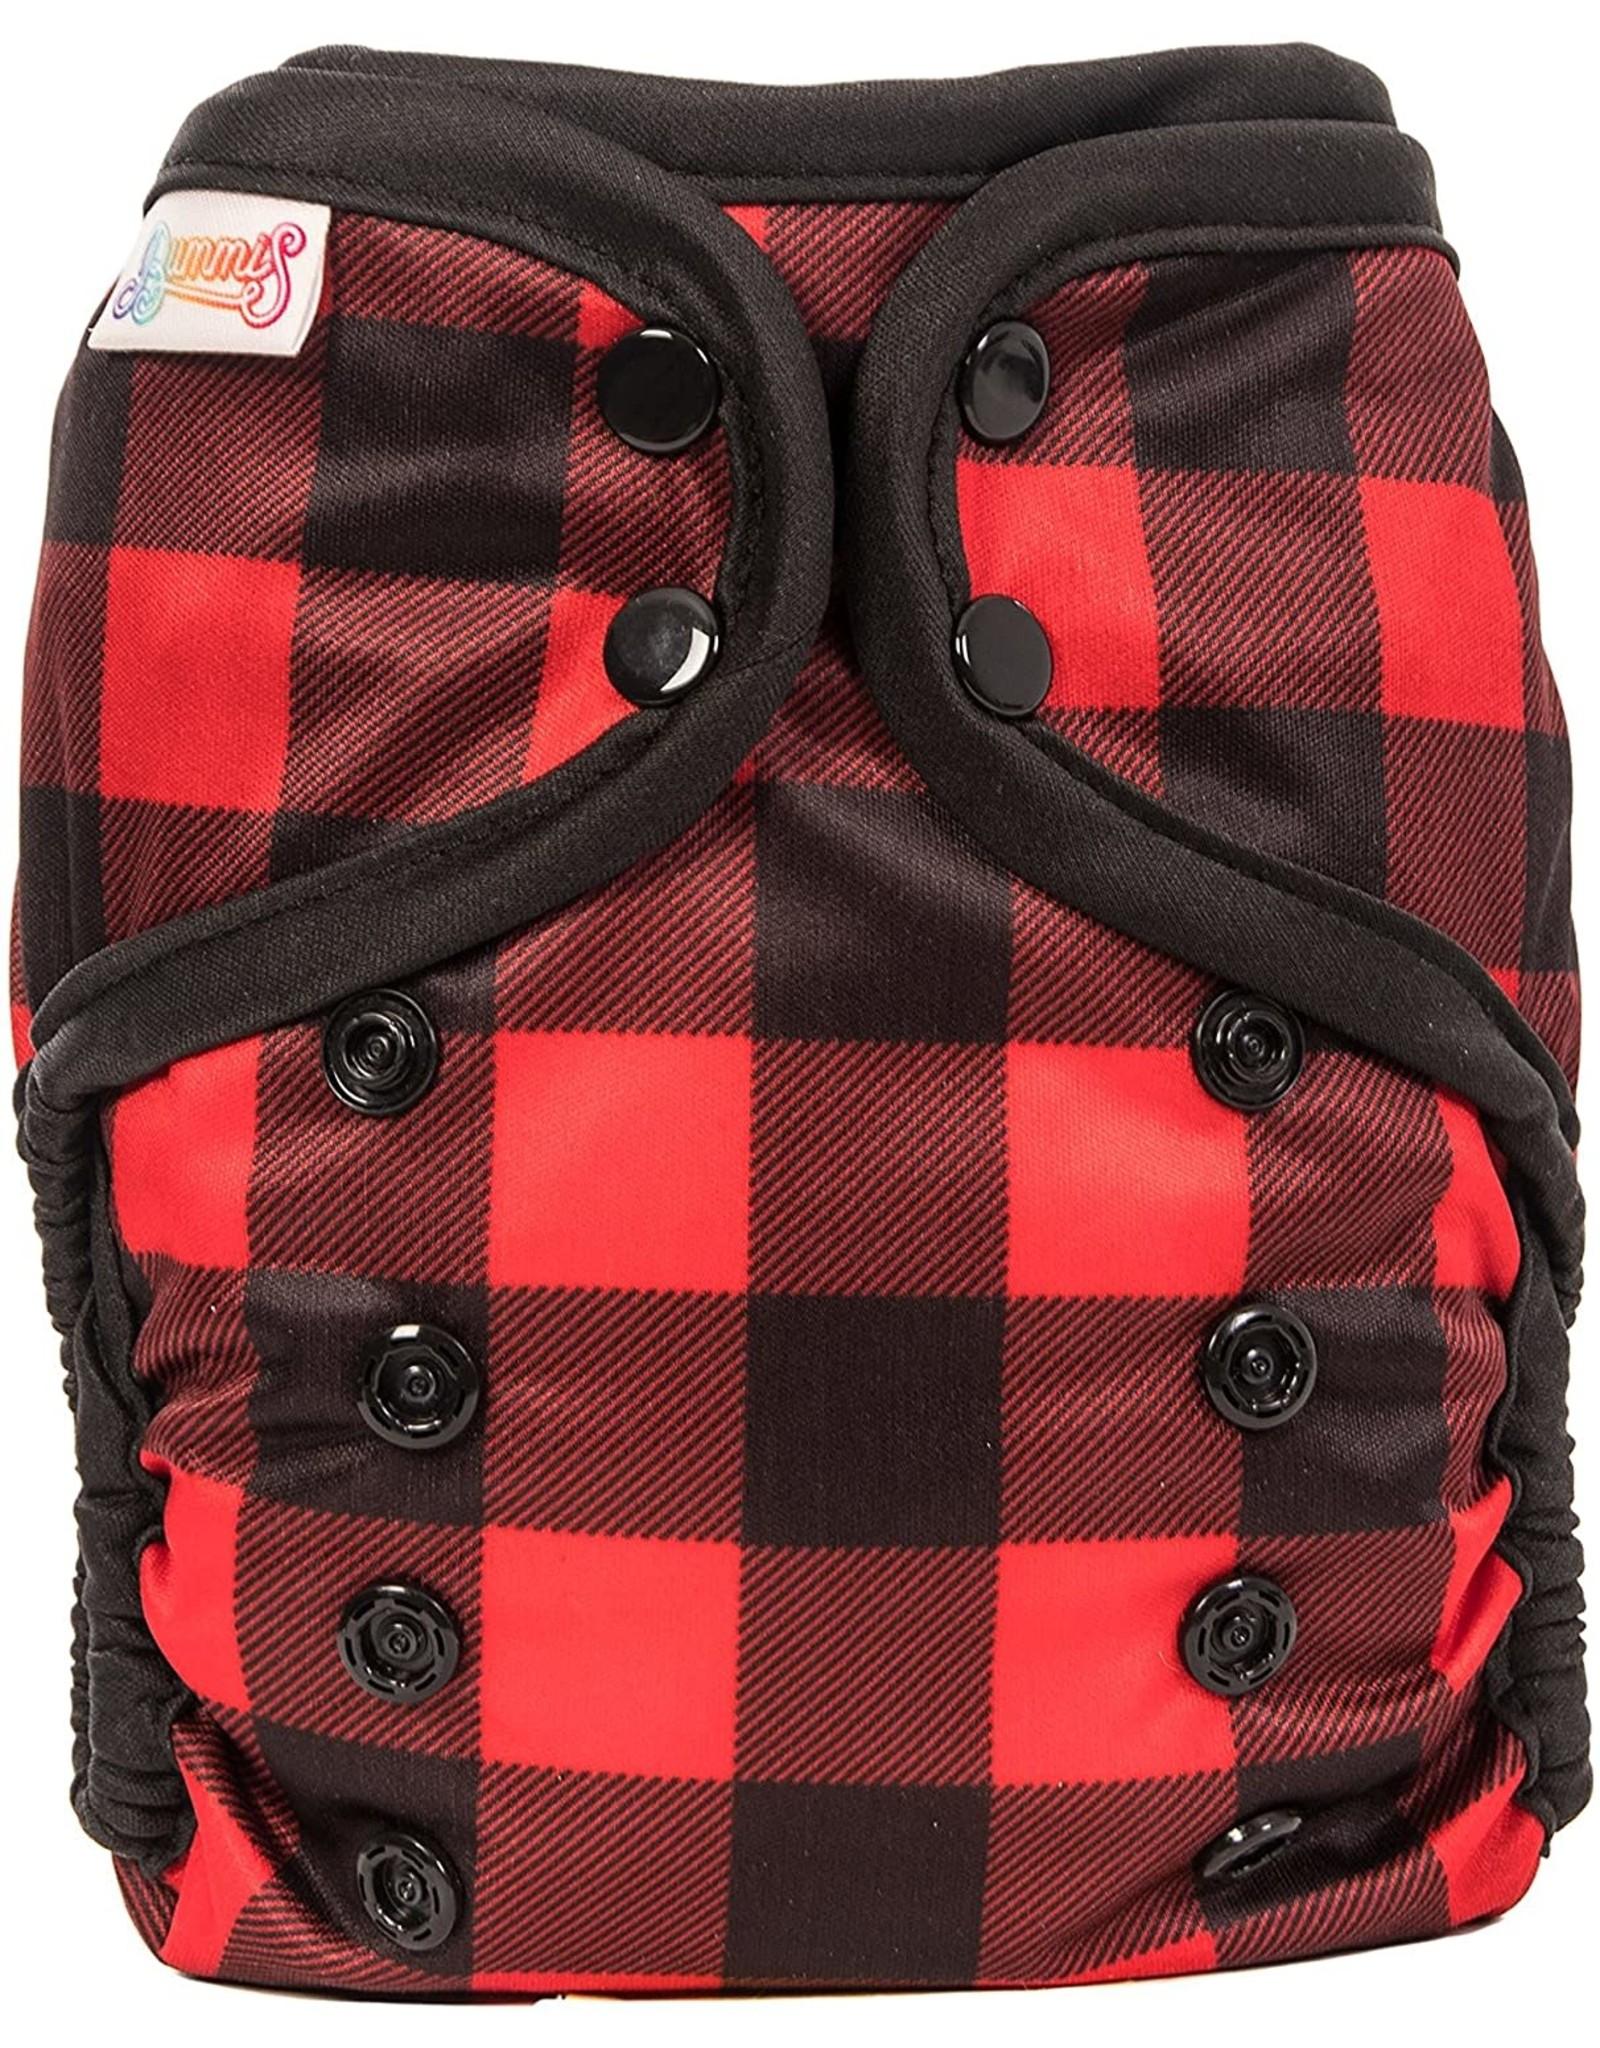 Bummis All-in-One Pure Diaper Lumberjack